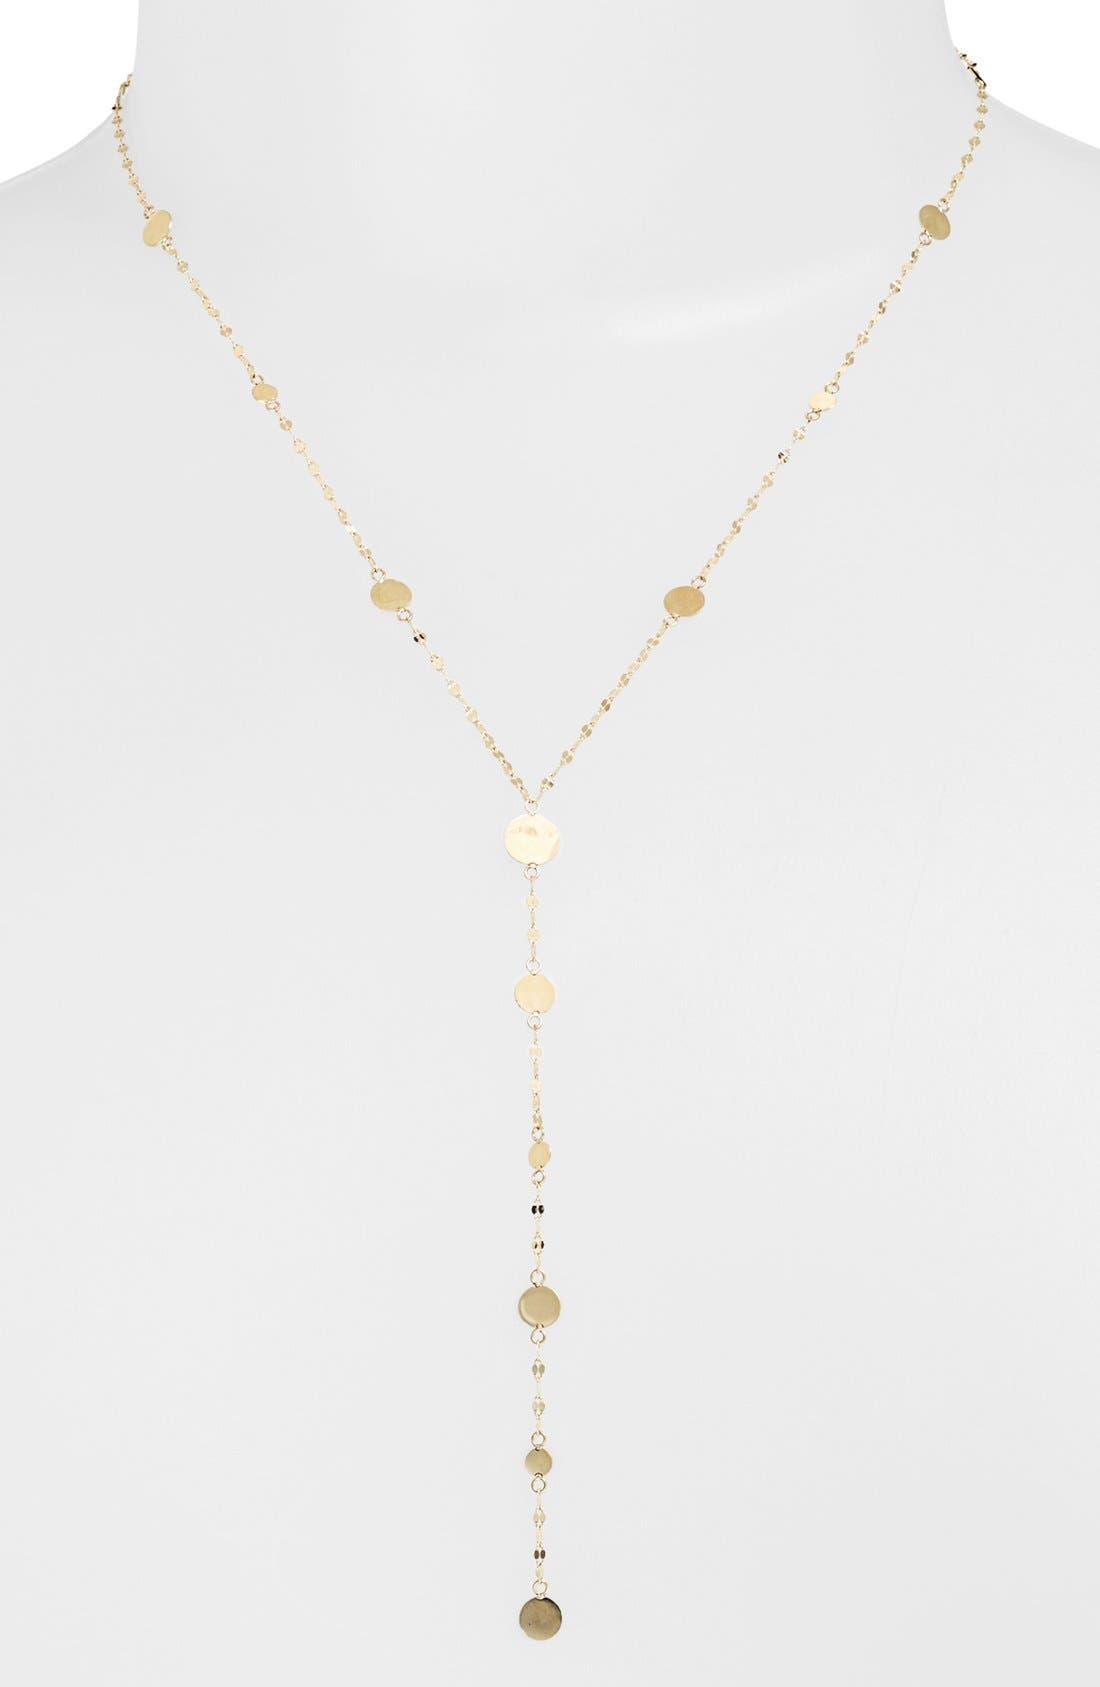 Main Image - Lana Jewelry 'Spellbound - Gypsy' Y-Necklace